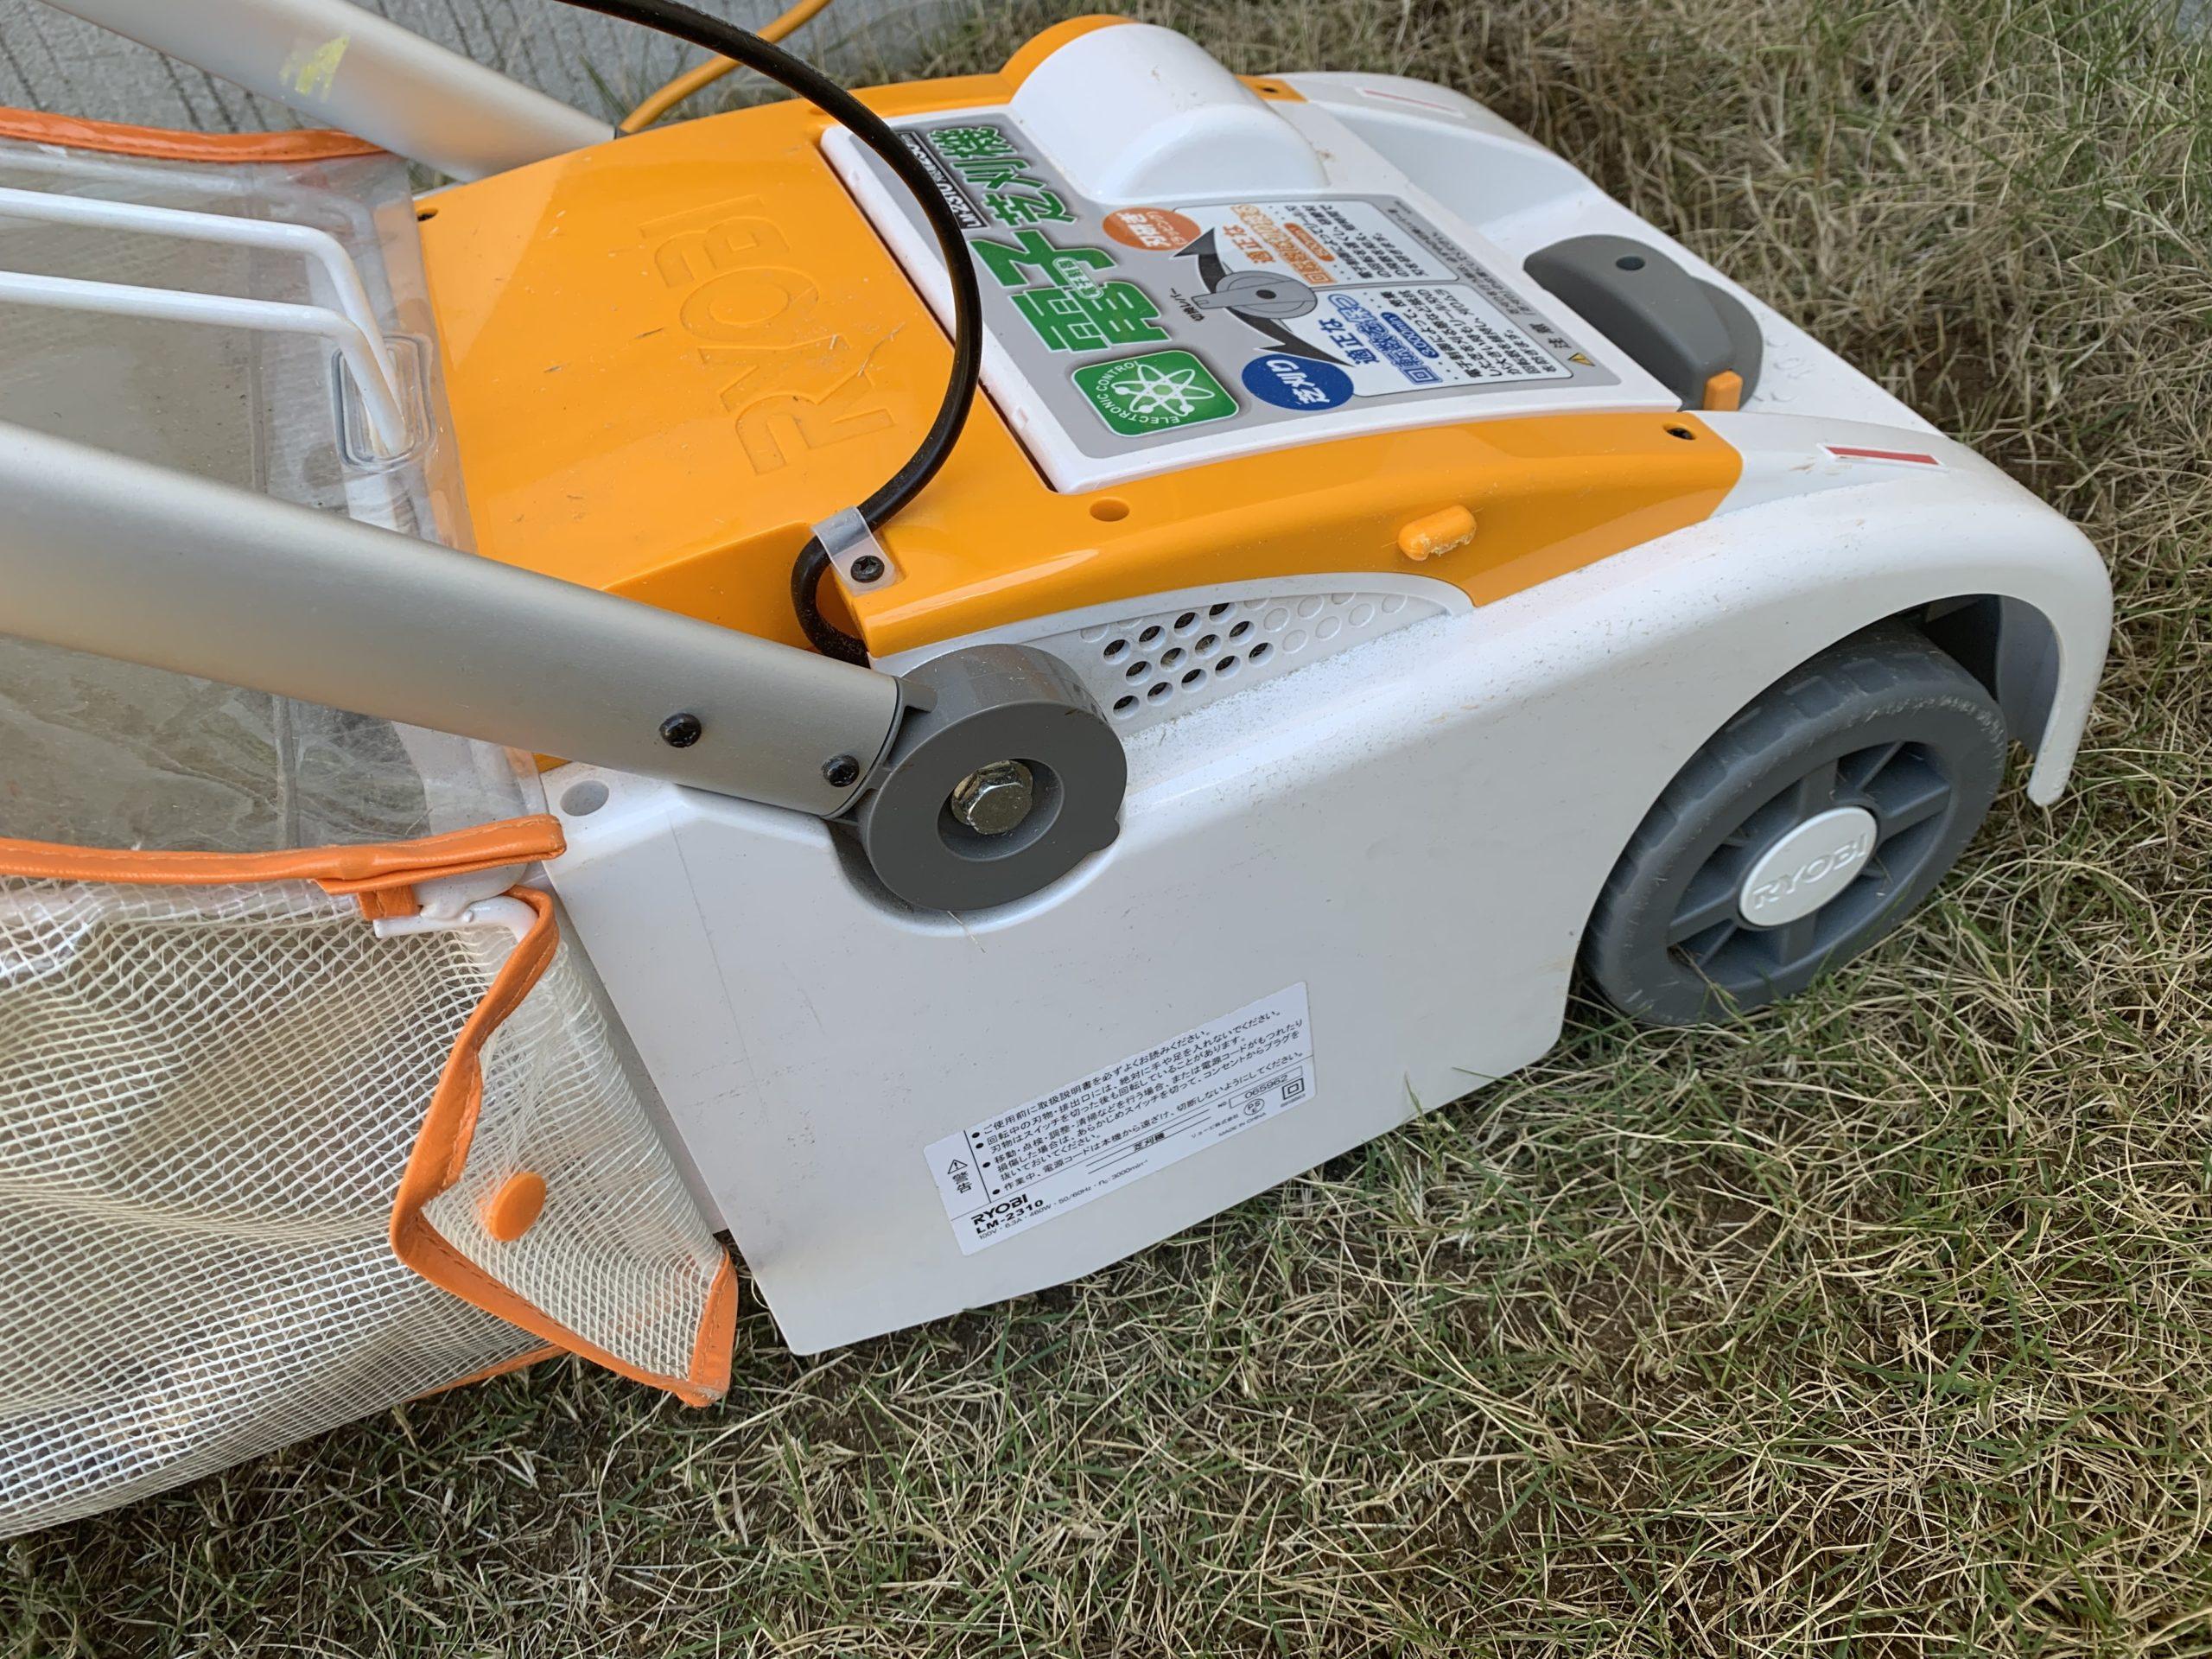 RYOBI電子芝刈り機LM-2310サッチング刃に付替え方法は?(サッチカス回収)